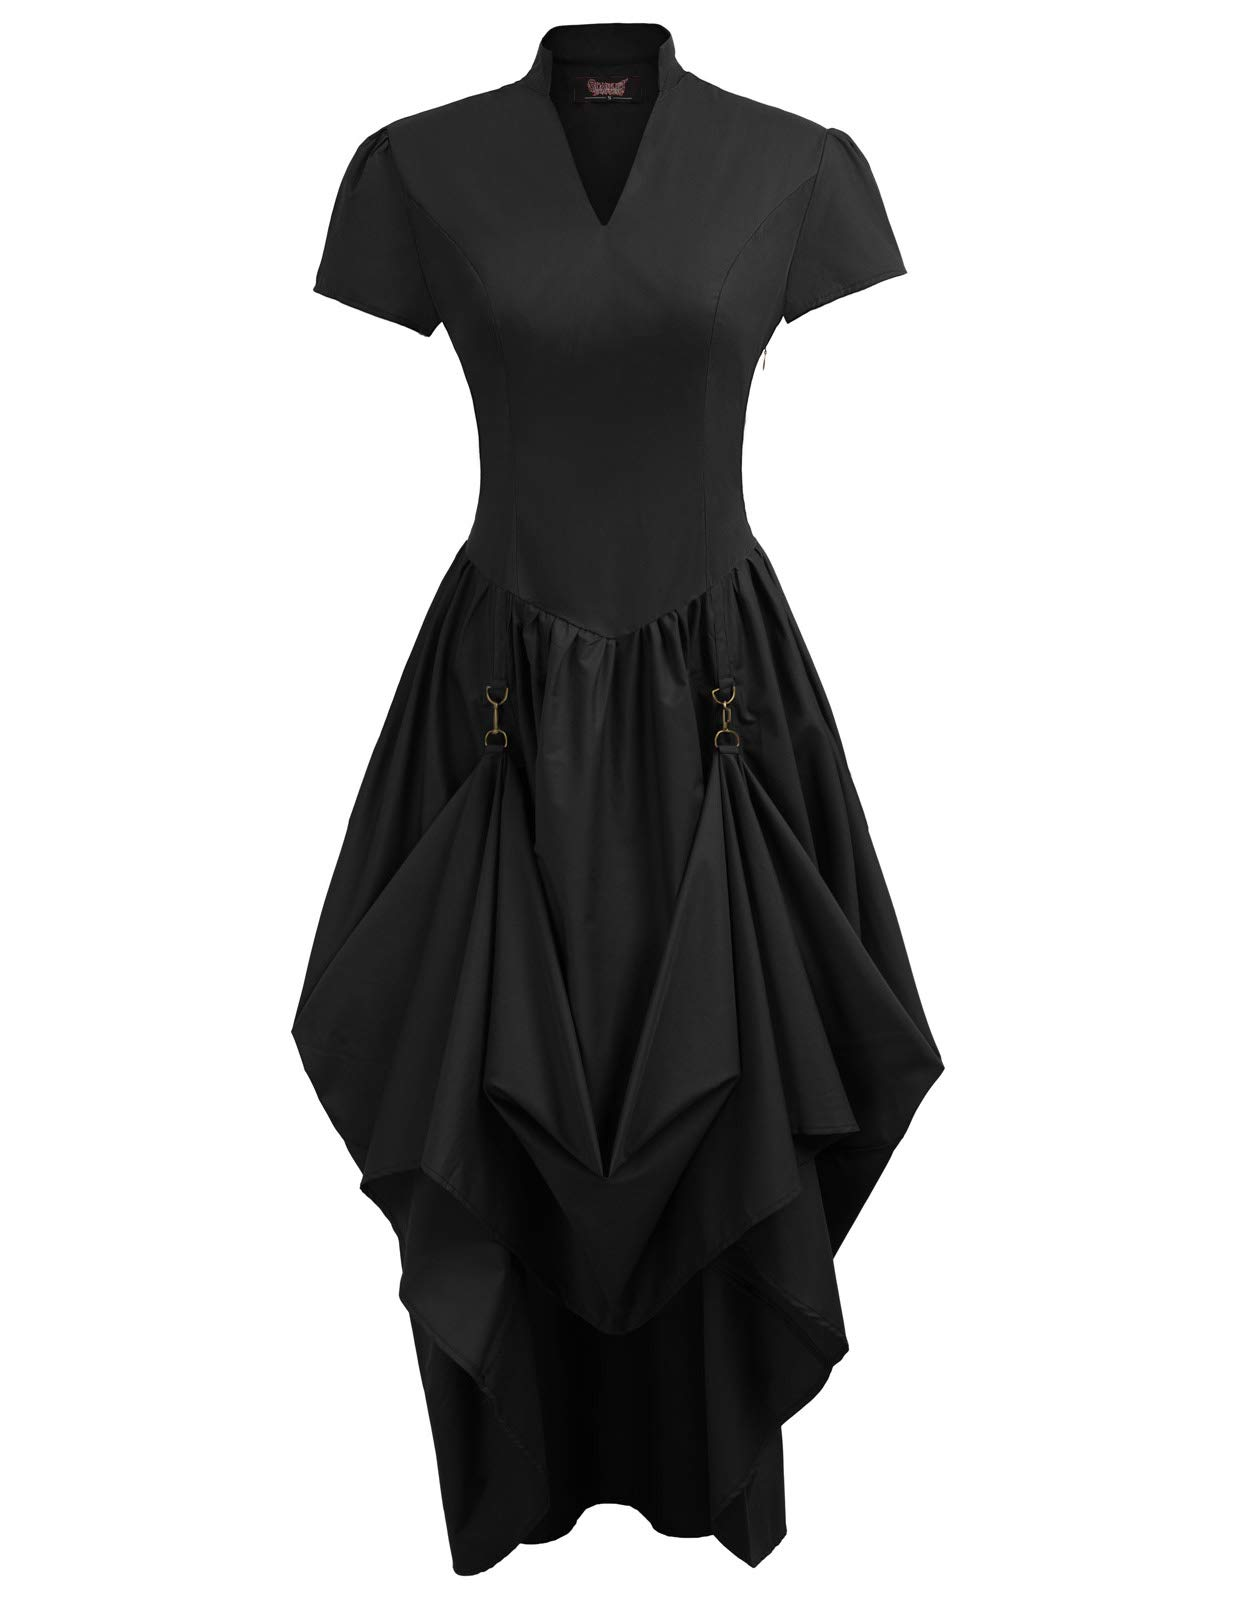 Women Victorian Vintage Steampunk Short Sleeve V-Neck Long Dress 4